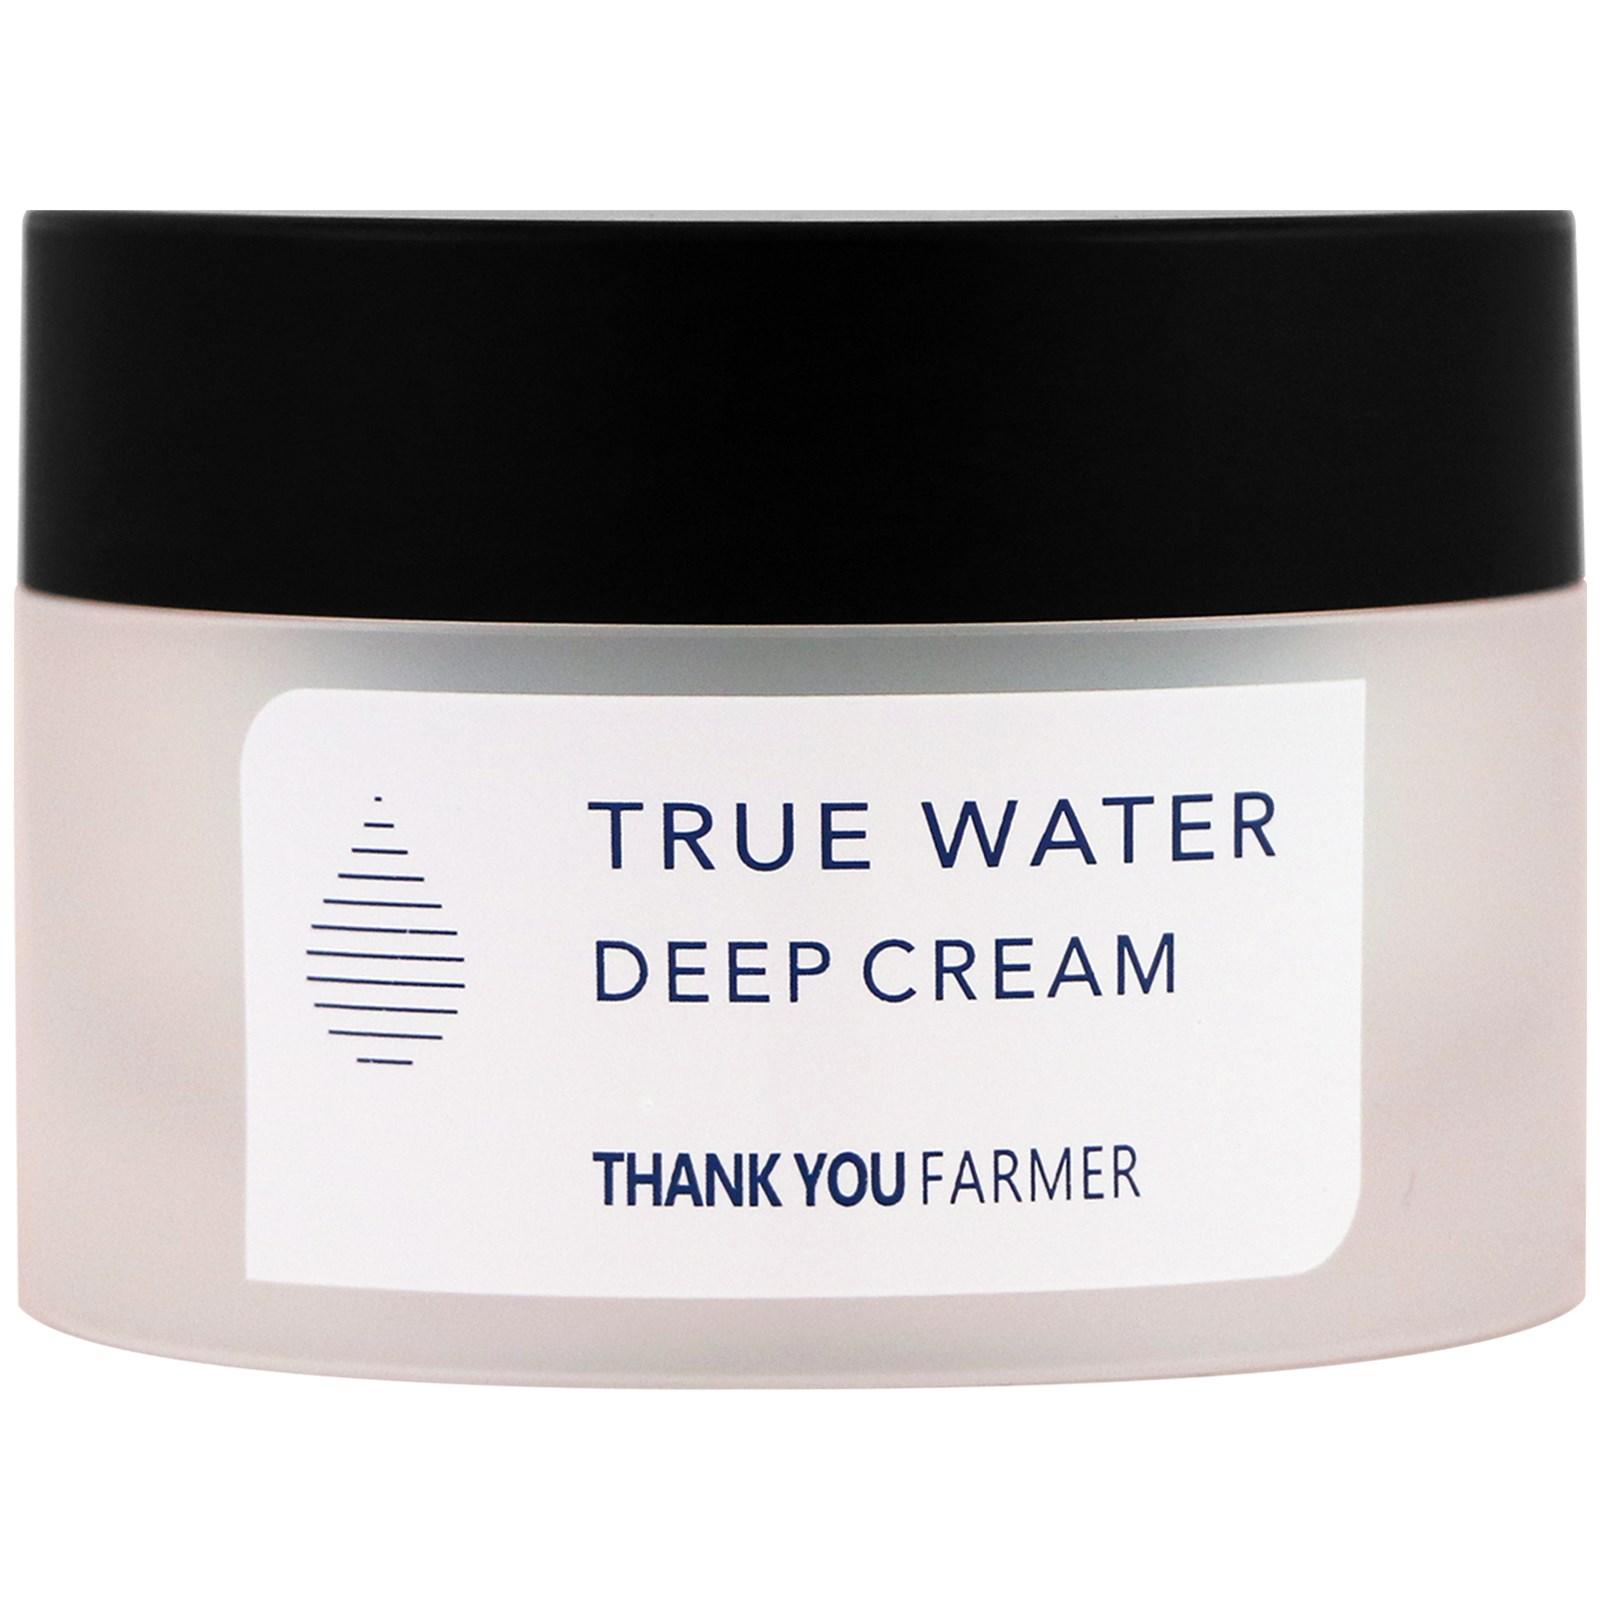 Thank You Farmer, Настоящая вода, глубоко увлажняющий крем, 1,75 жидк. унц. (50 мл)